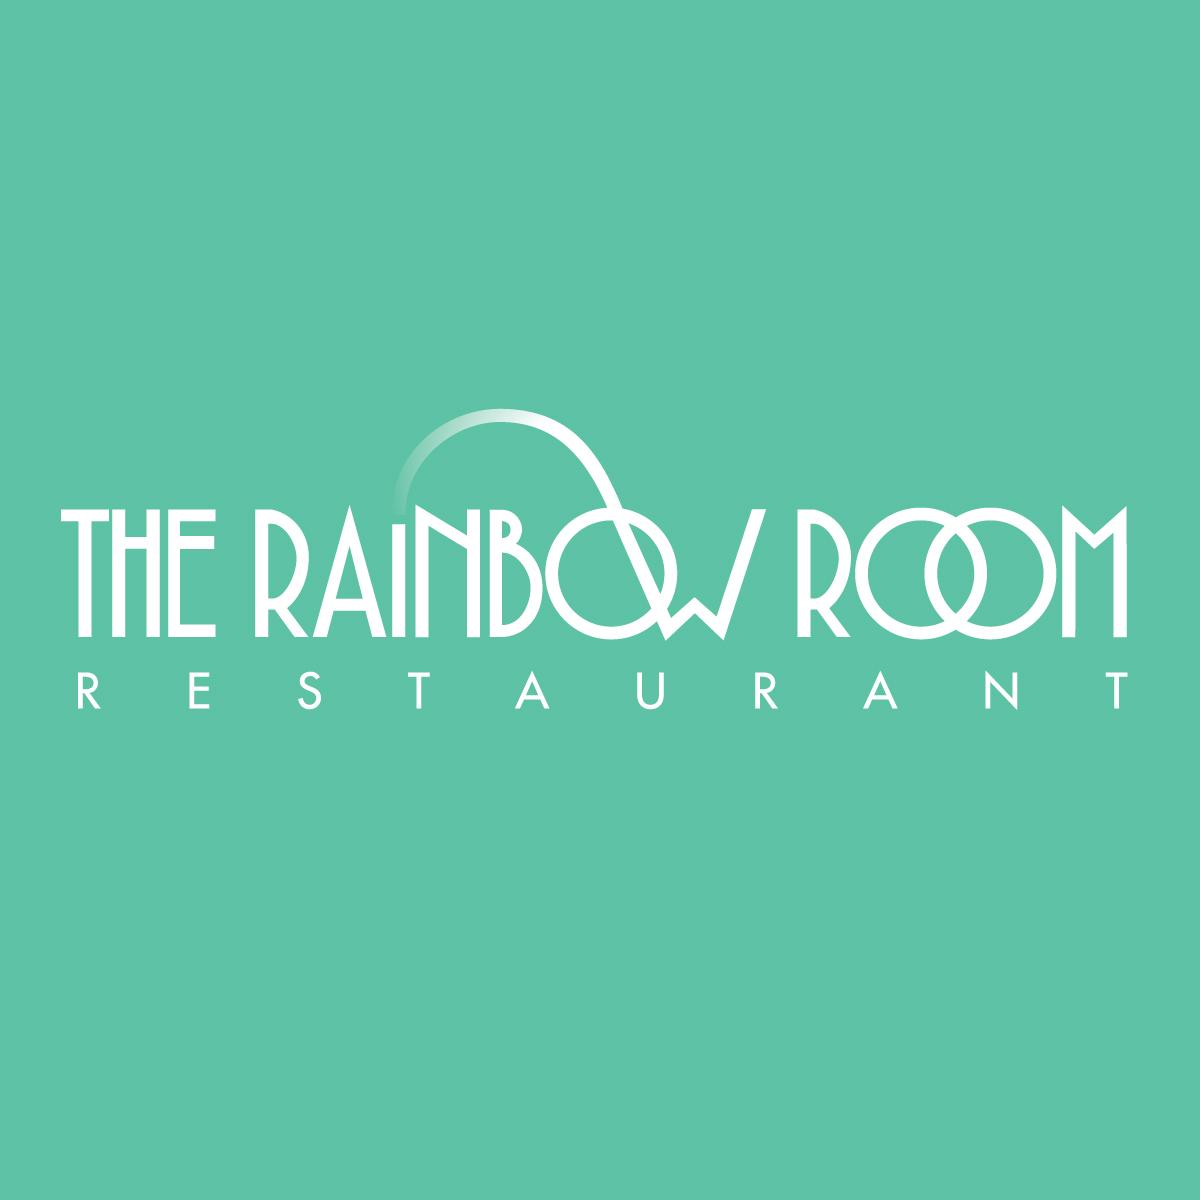 TheRainbowRoom_logo_01.jpg